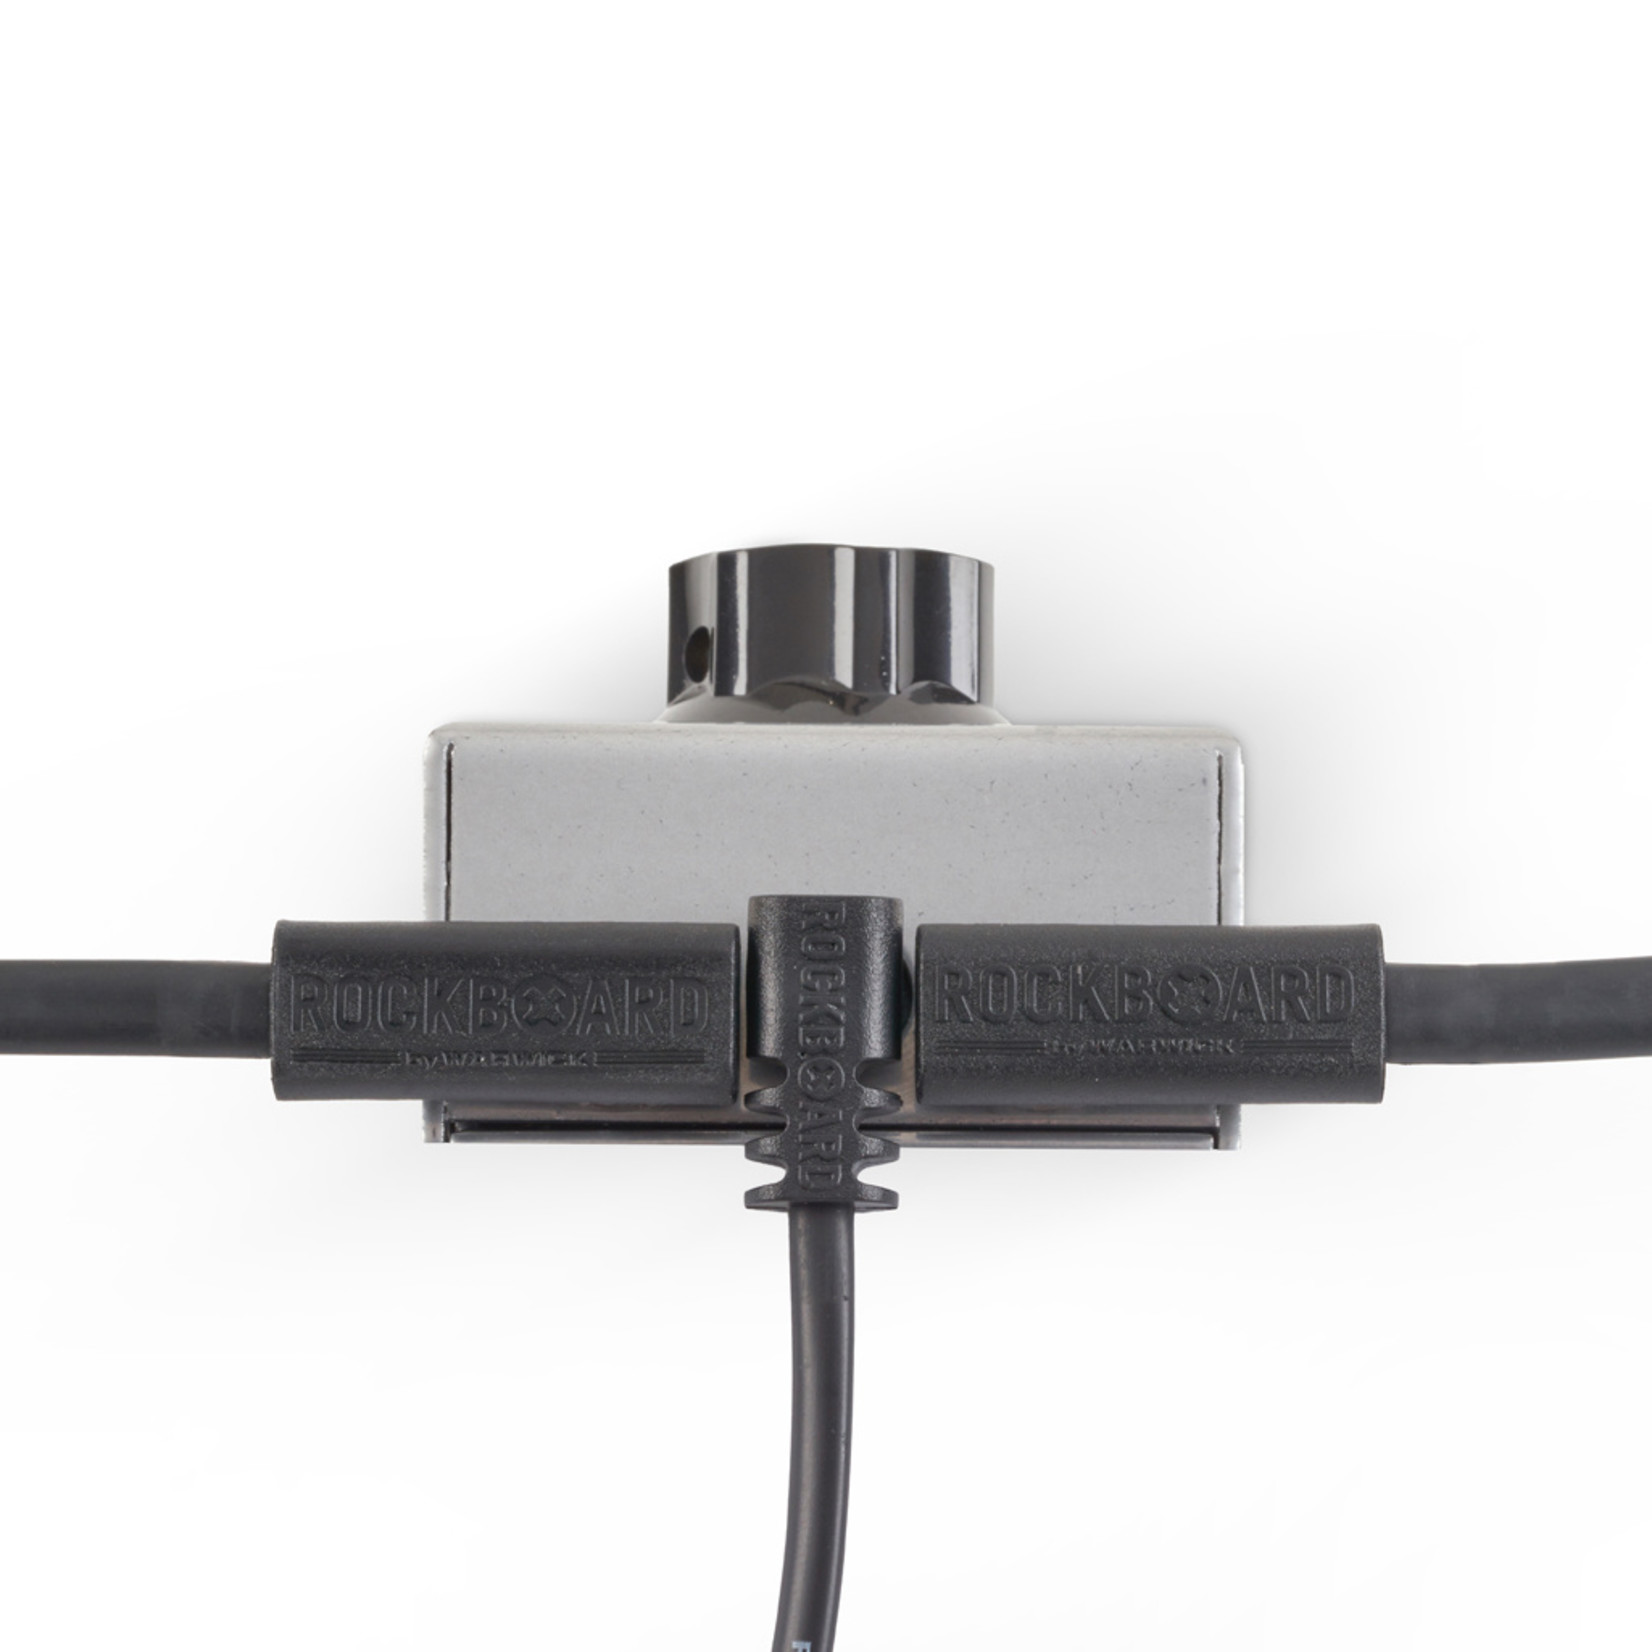 "Rockboard RockBoard Flat Power Cable - Angled/Straight - 30 cm / 11 13/16"""